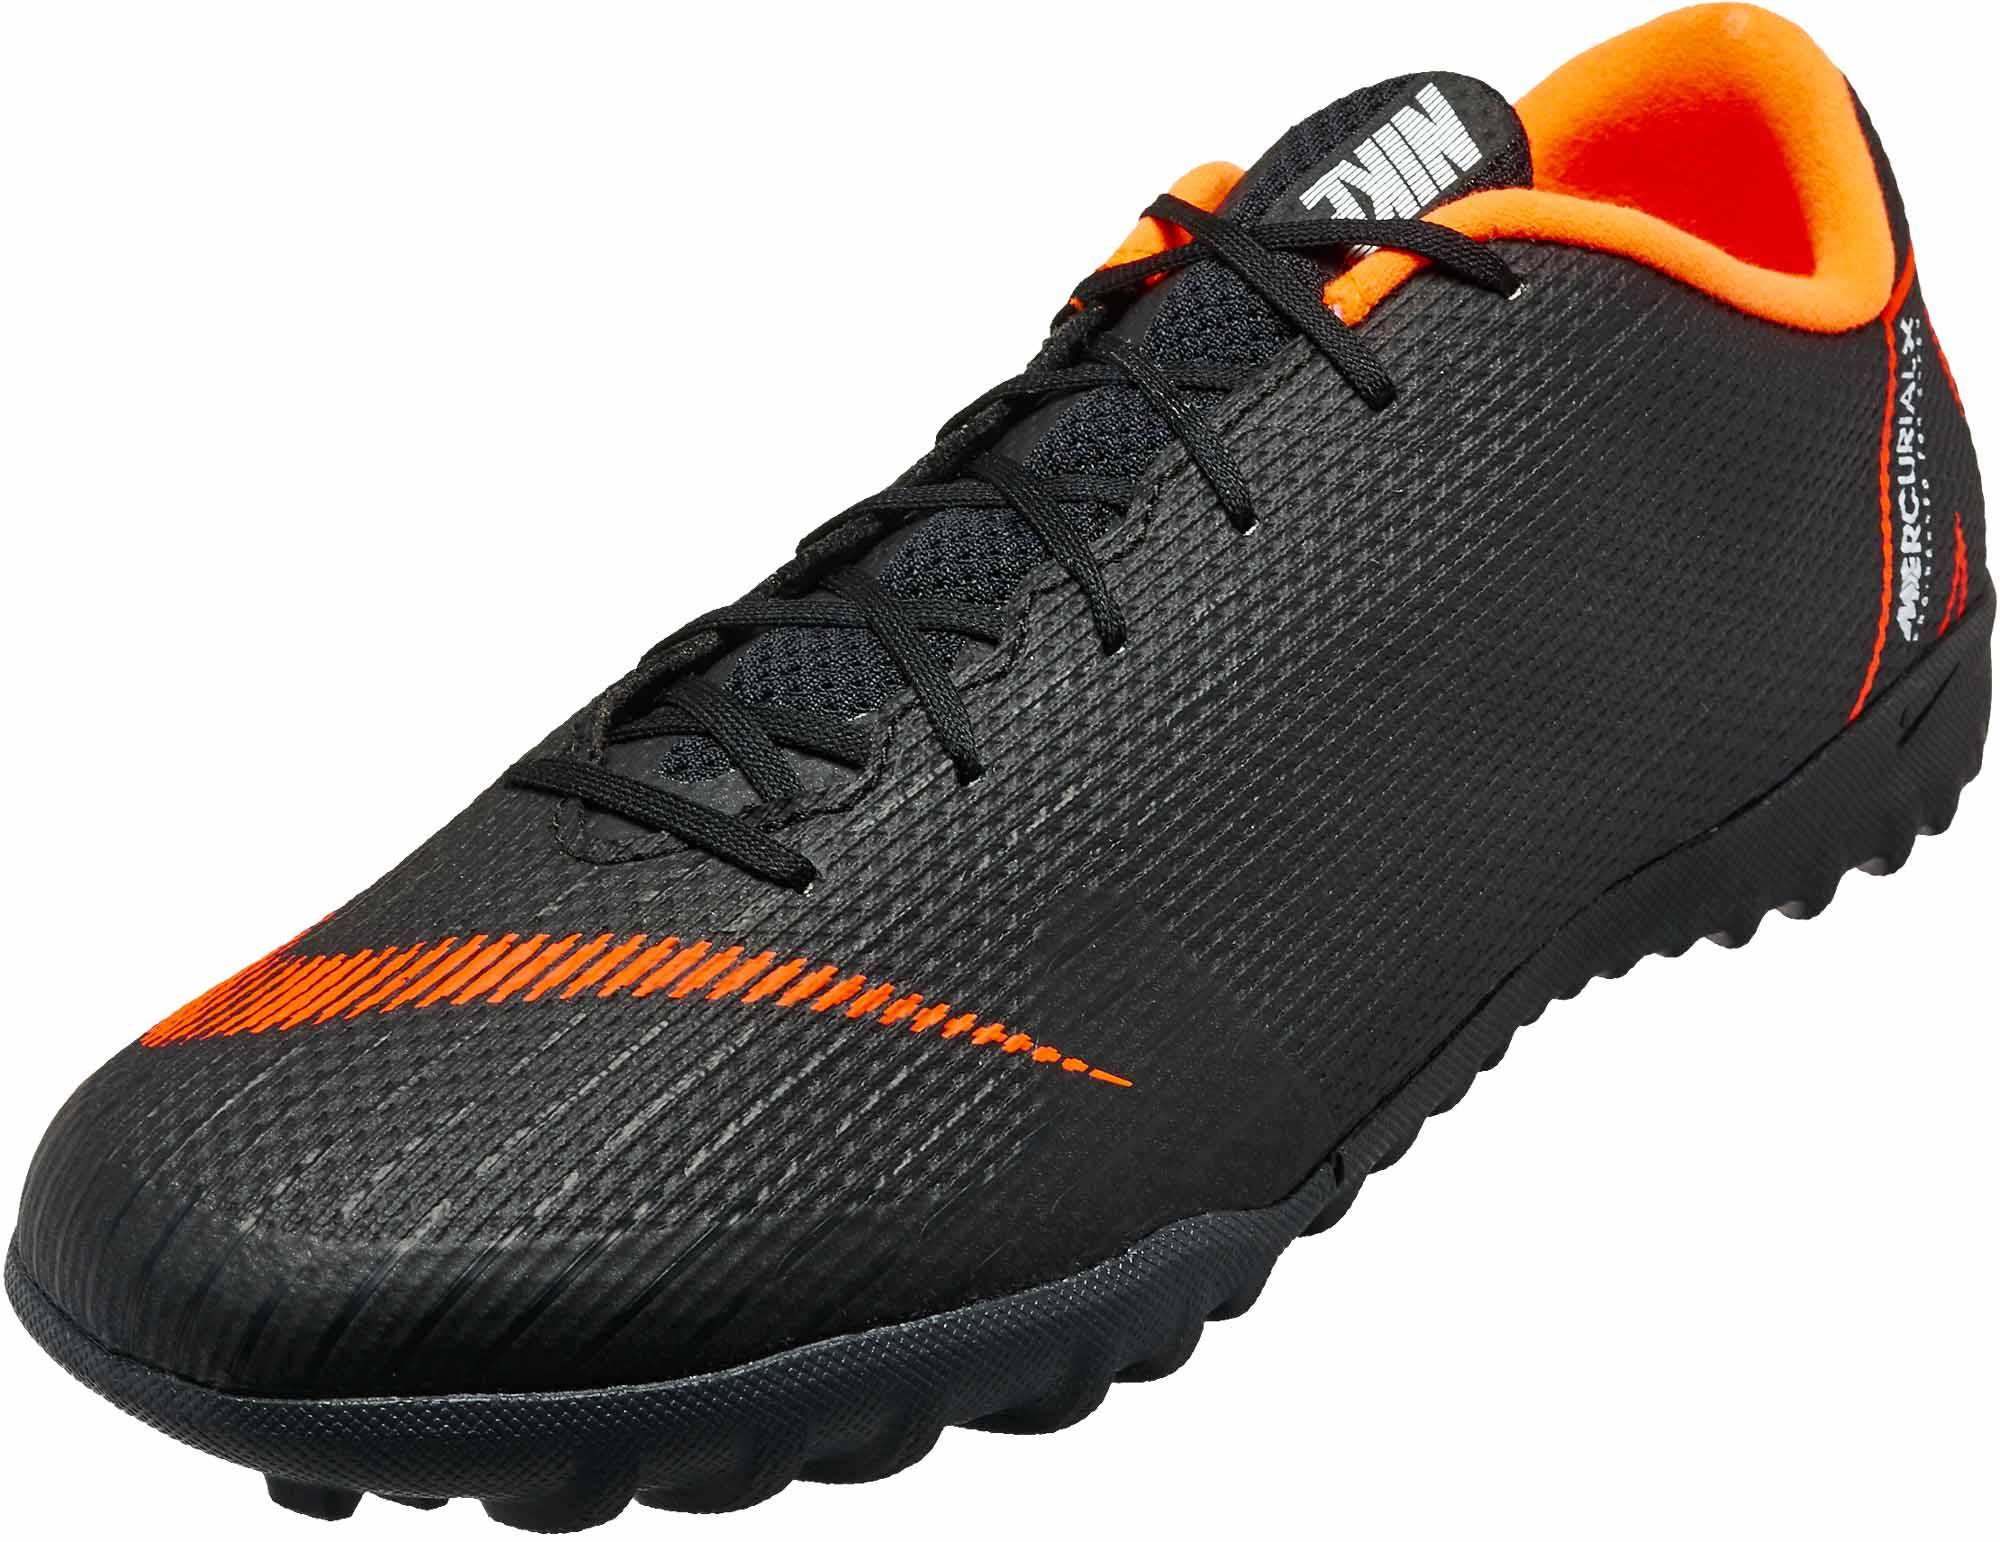 instinto embargo protestante  Nike VaporX 12 Academy TF - Black & Total Orange